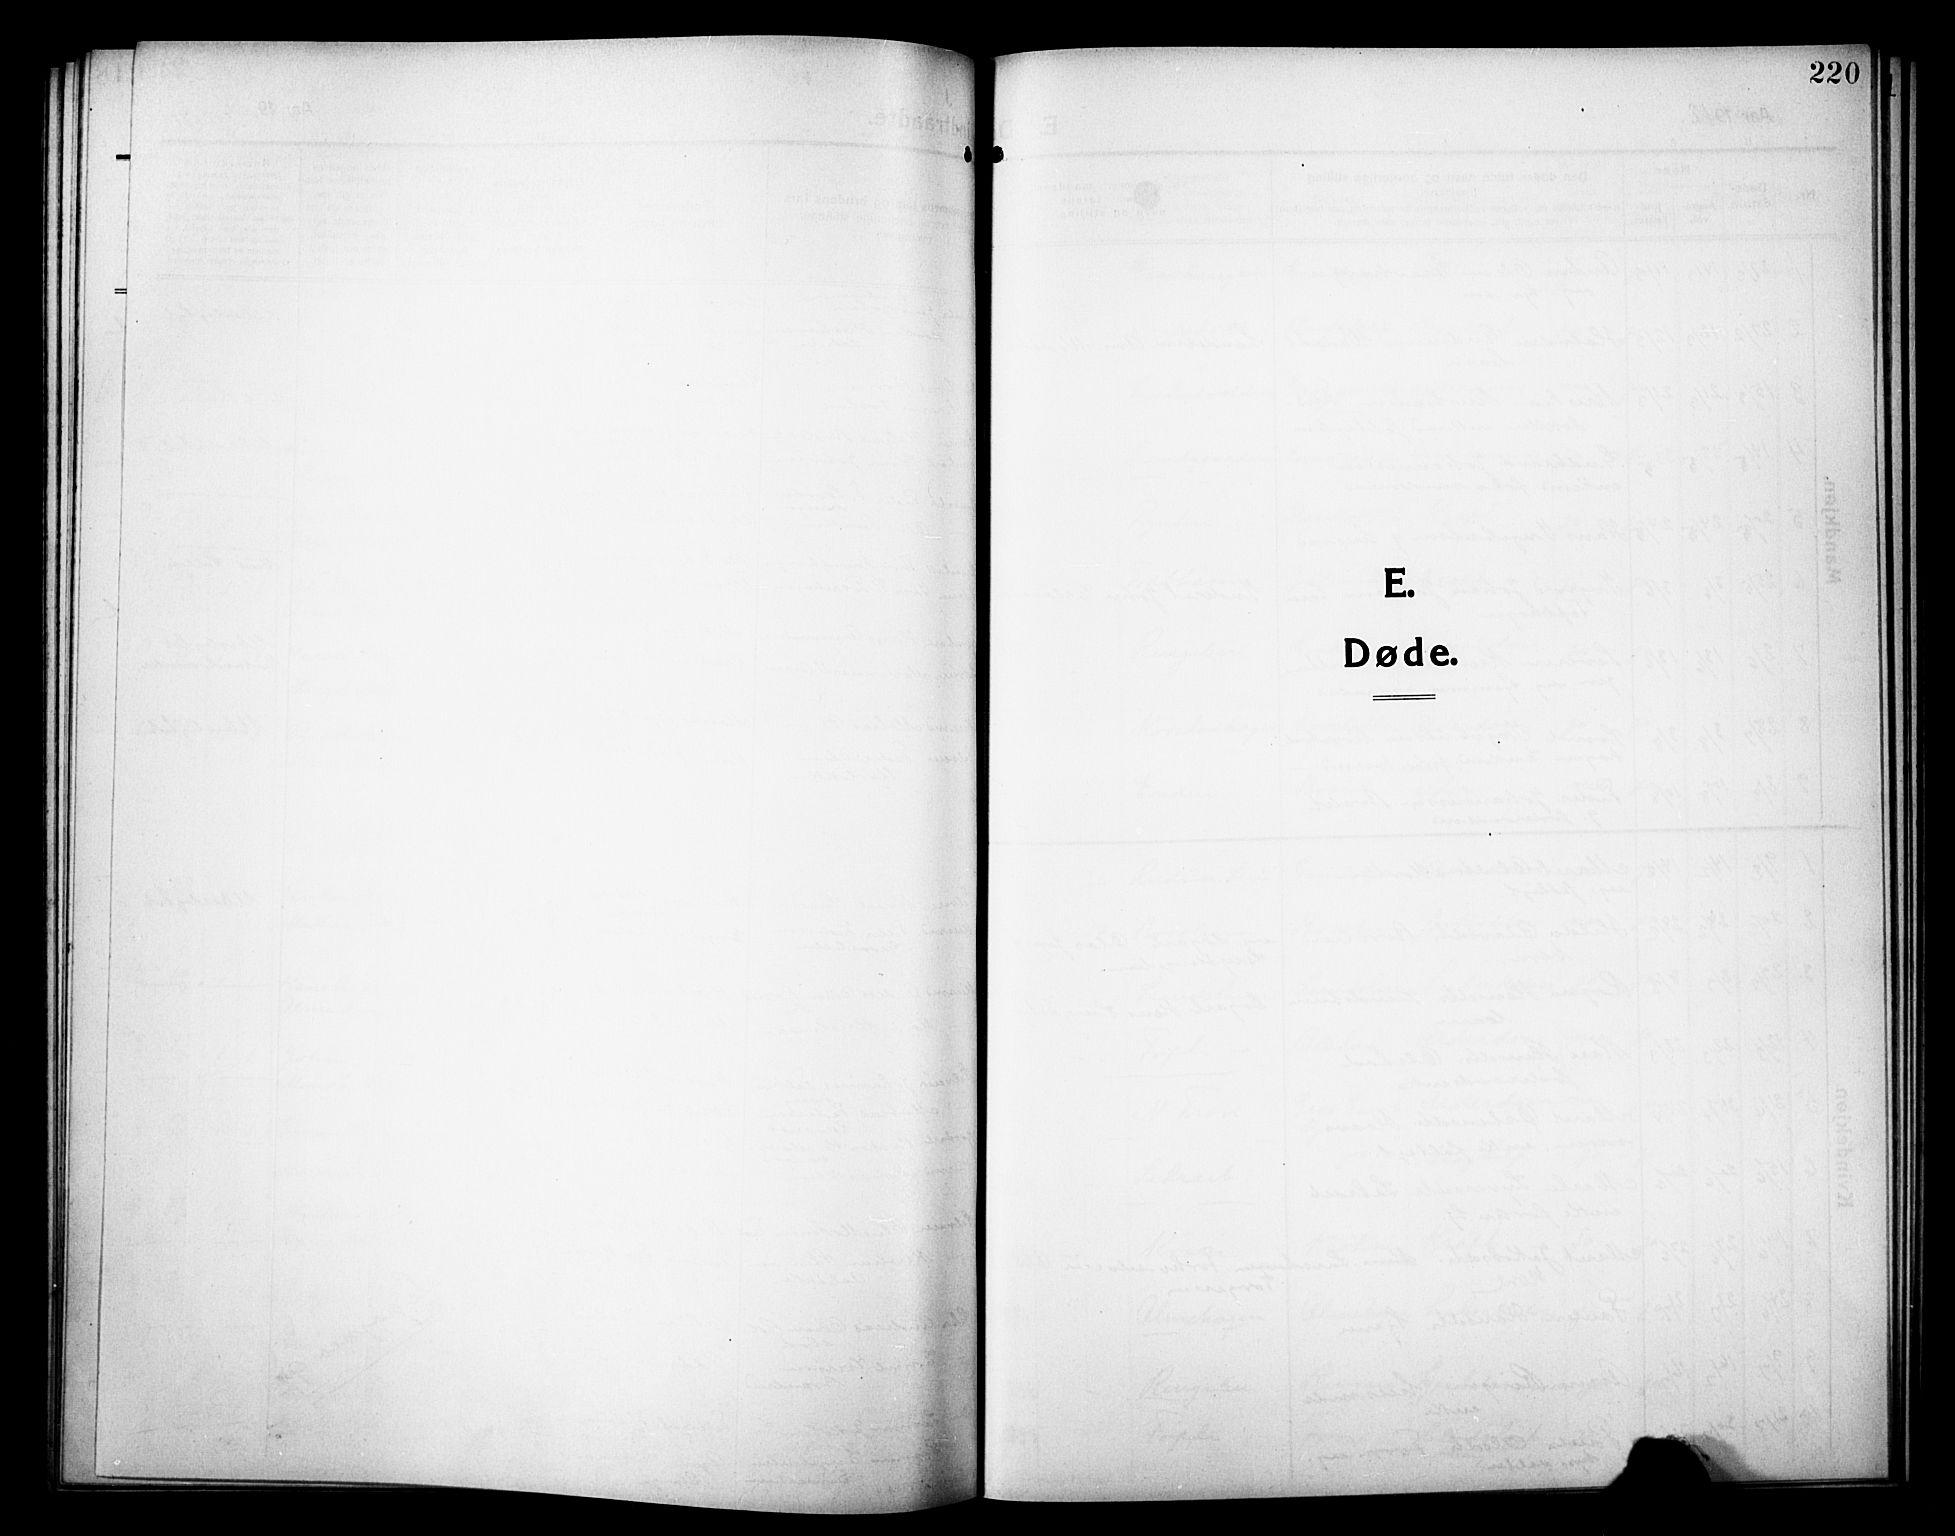 SAH, Sør-Fron prestekontor, H/Ha/Hab/L0005: Klokkerbok nr. 5, 1912-1930, s. 220